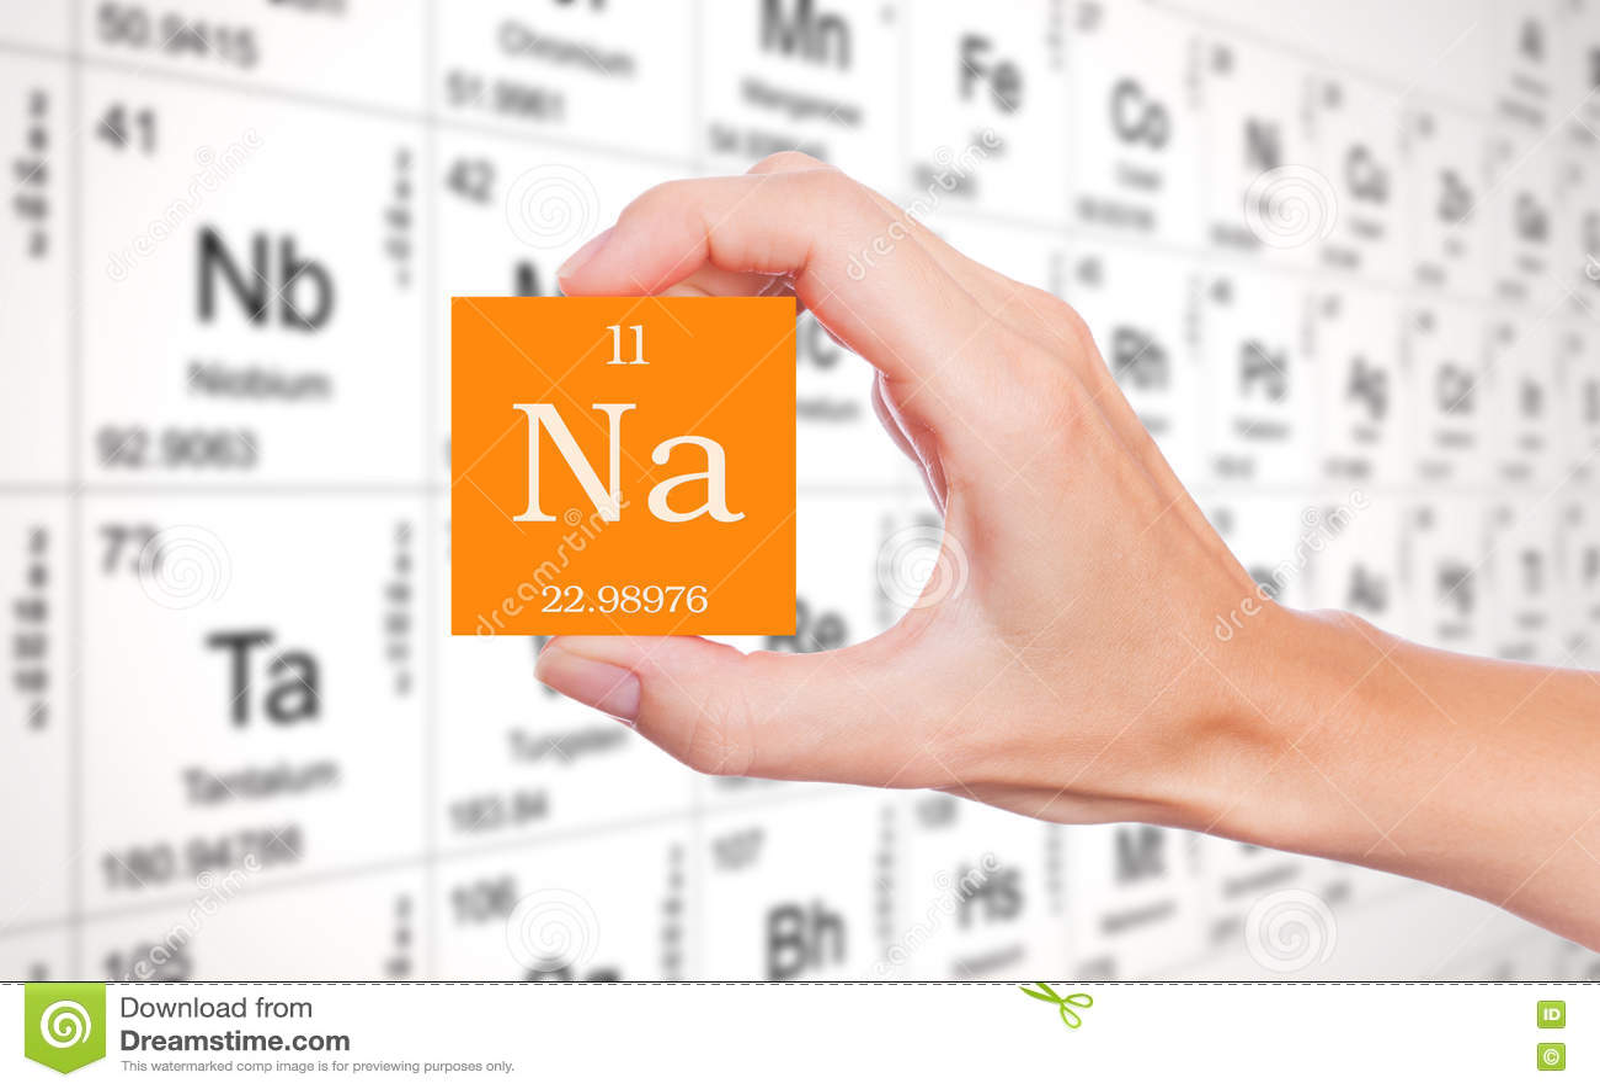 Natrium Element On Orange Square Stock Photo Image Of Element